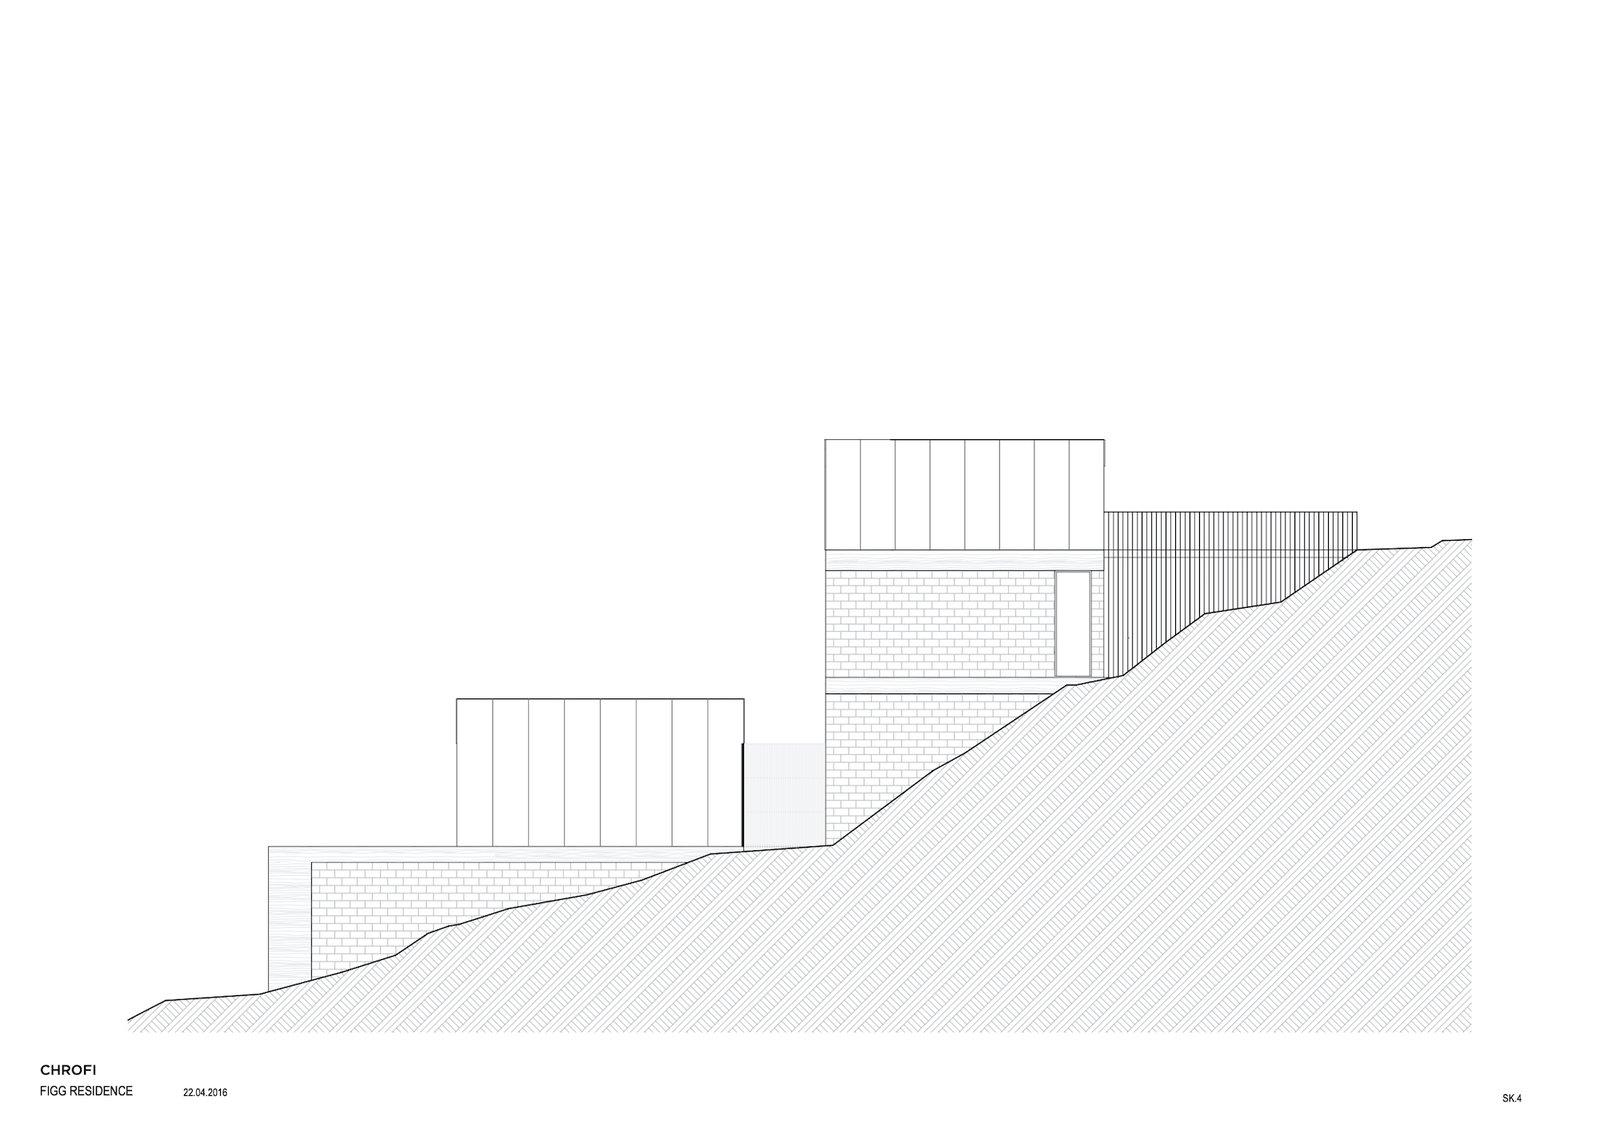 Elevation of Church Point House by CHROFI.